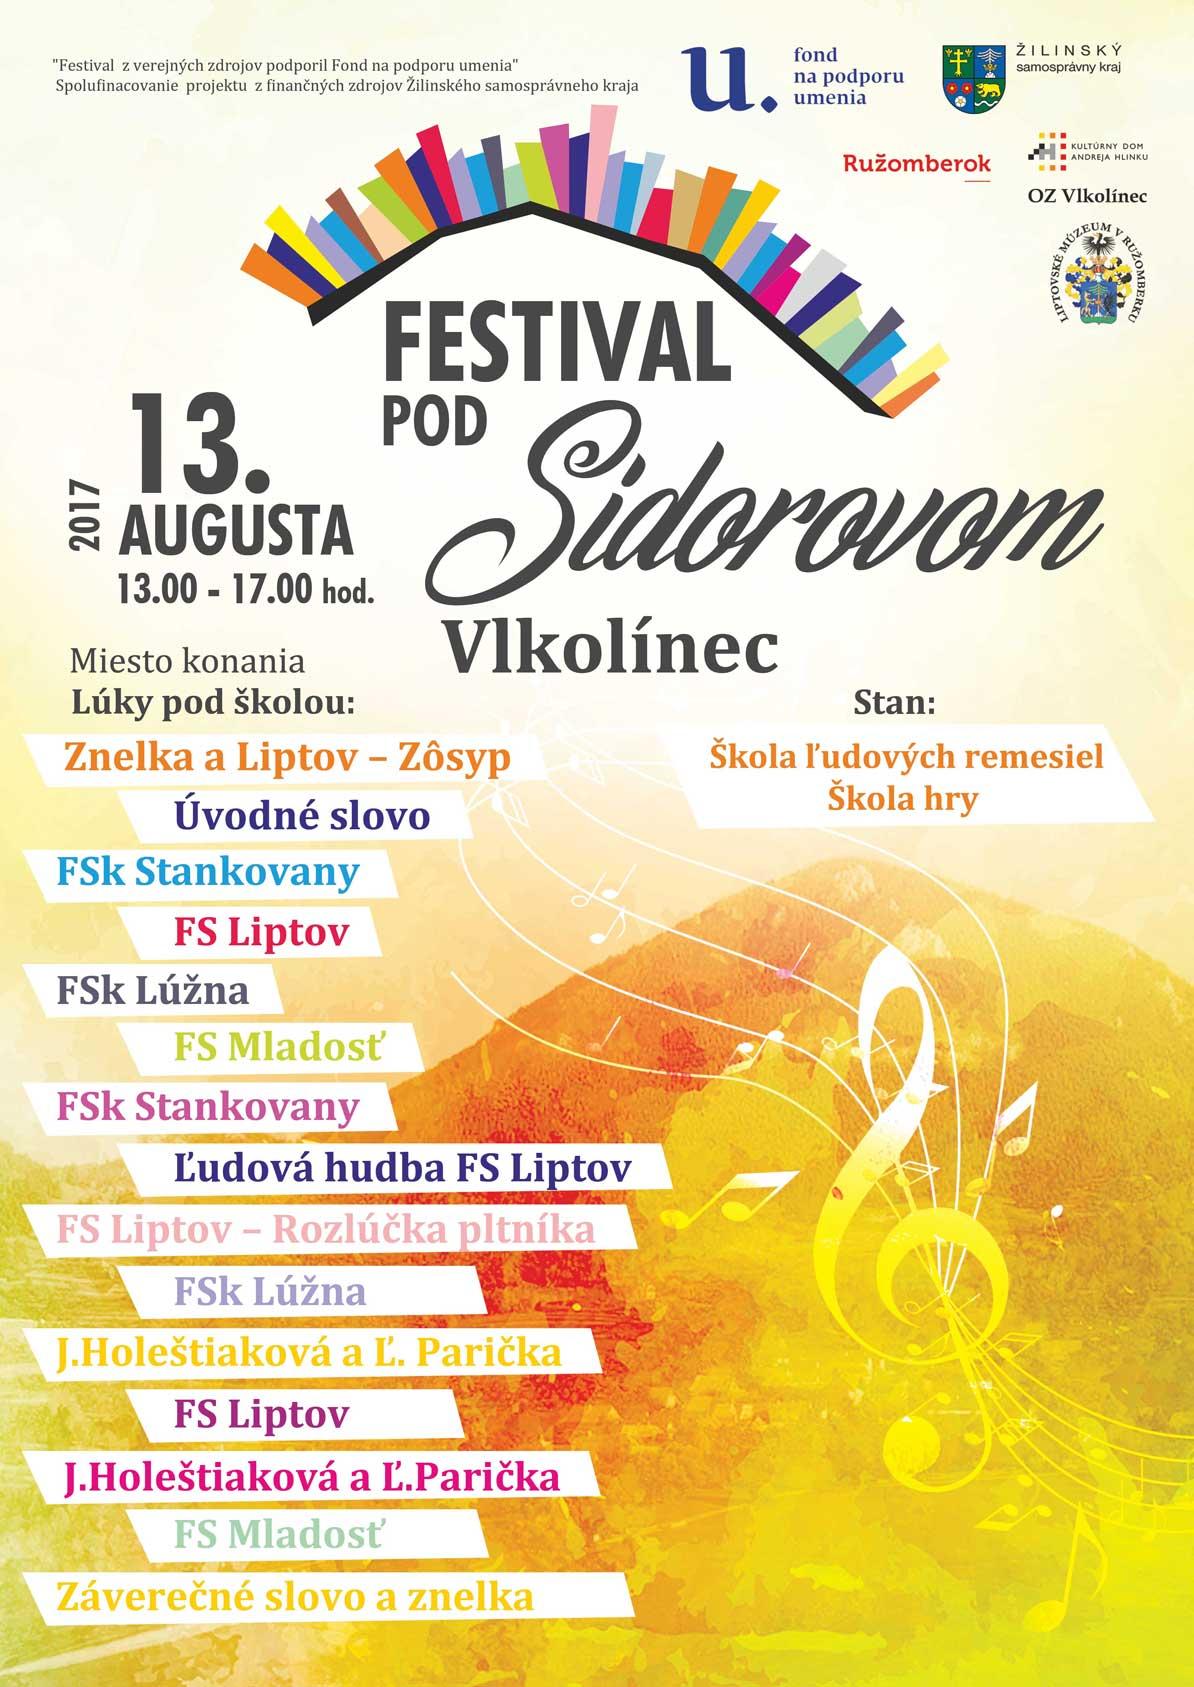 festival-pod-sidorovom-plagát-webb